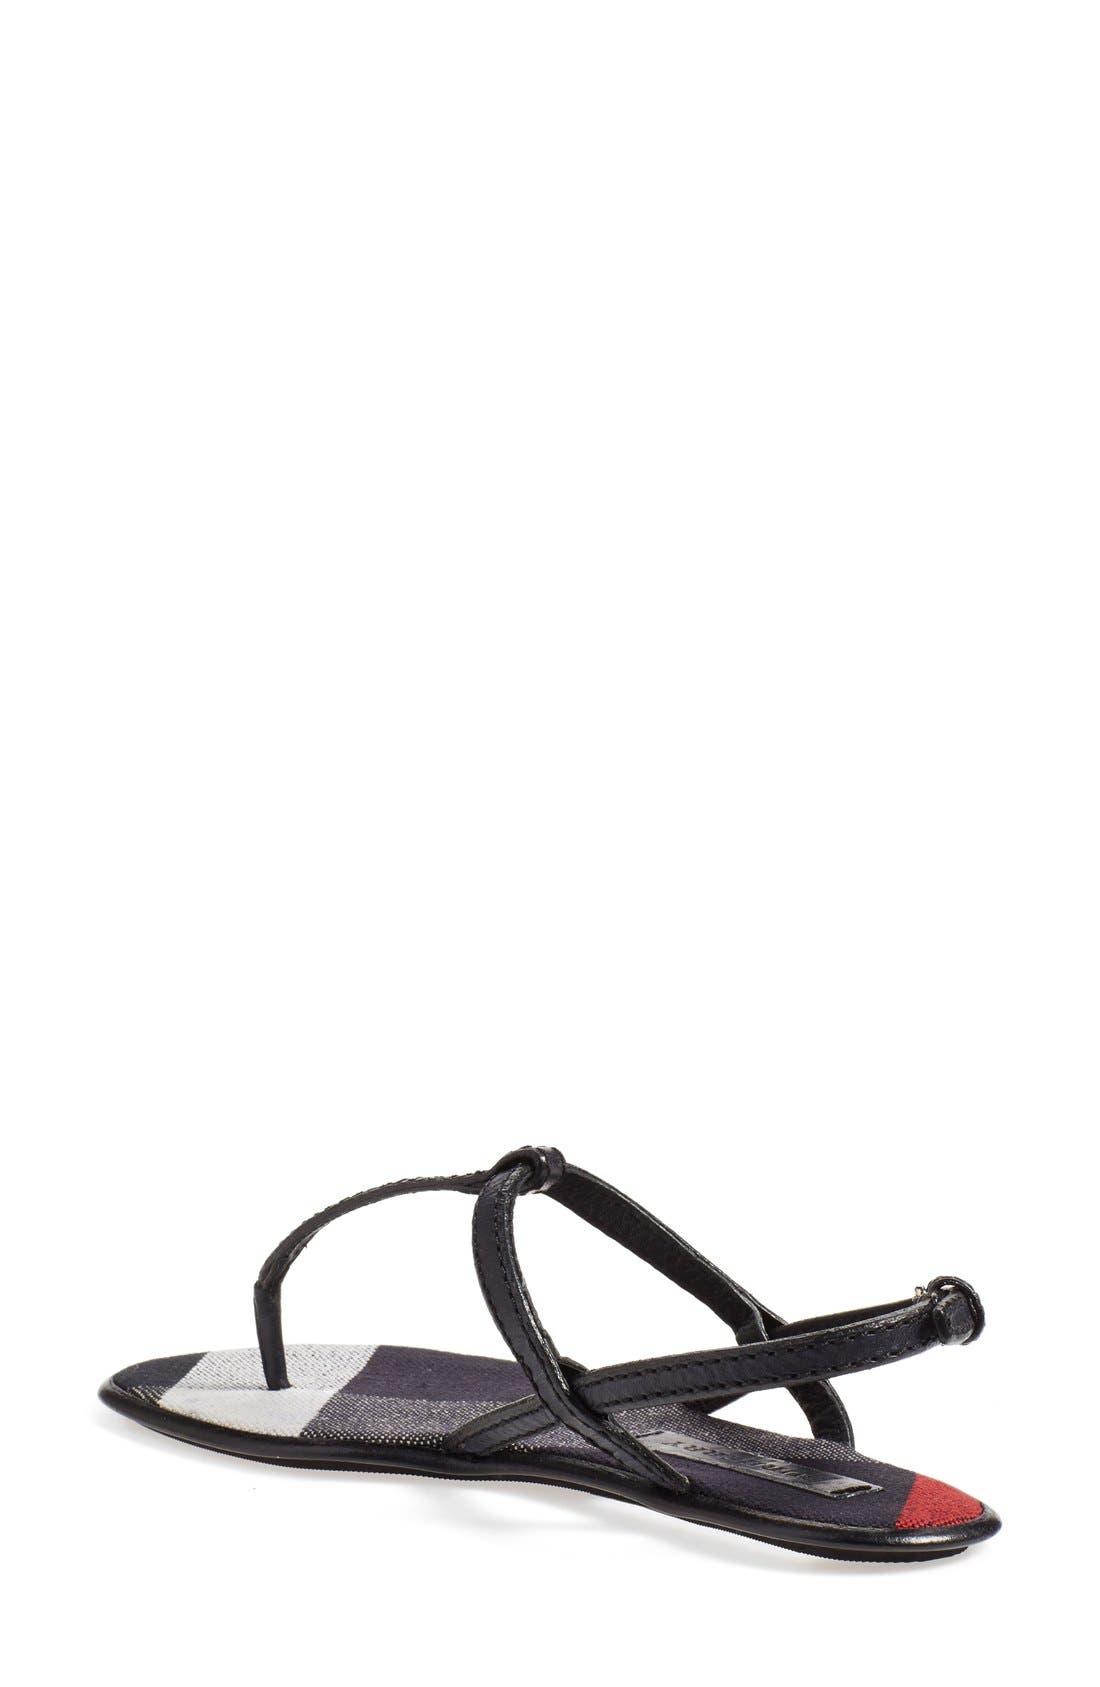 Alternate Image 2  - Burberry 'Ingeldew' T-Strap Sandal (Women)